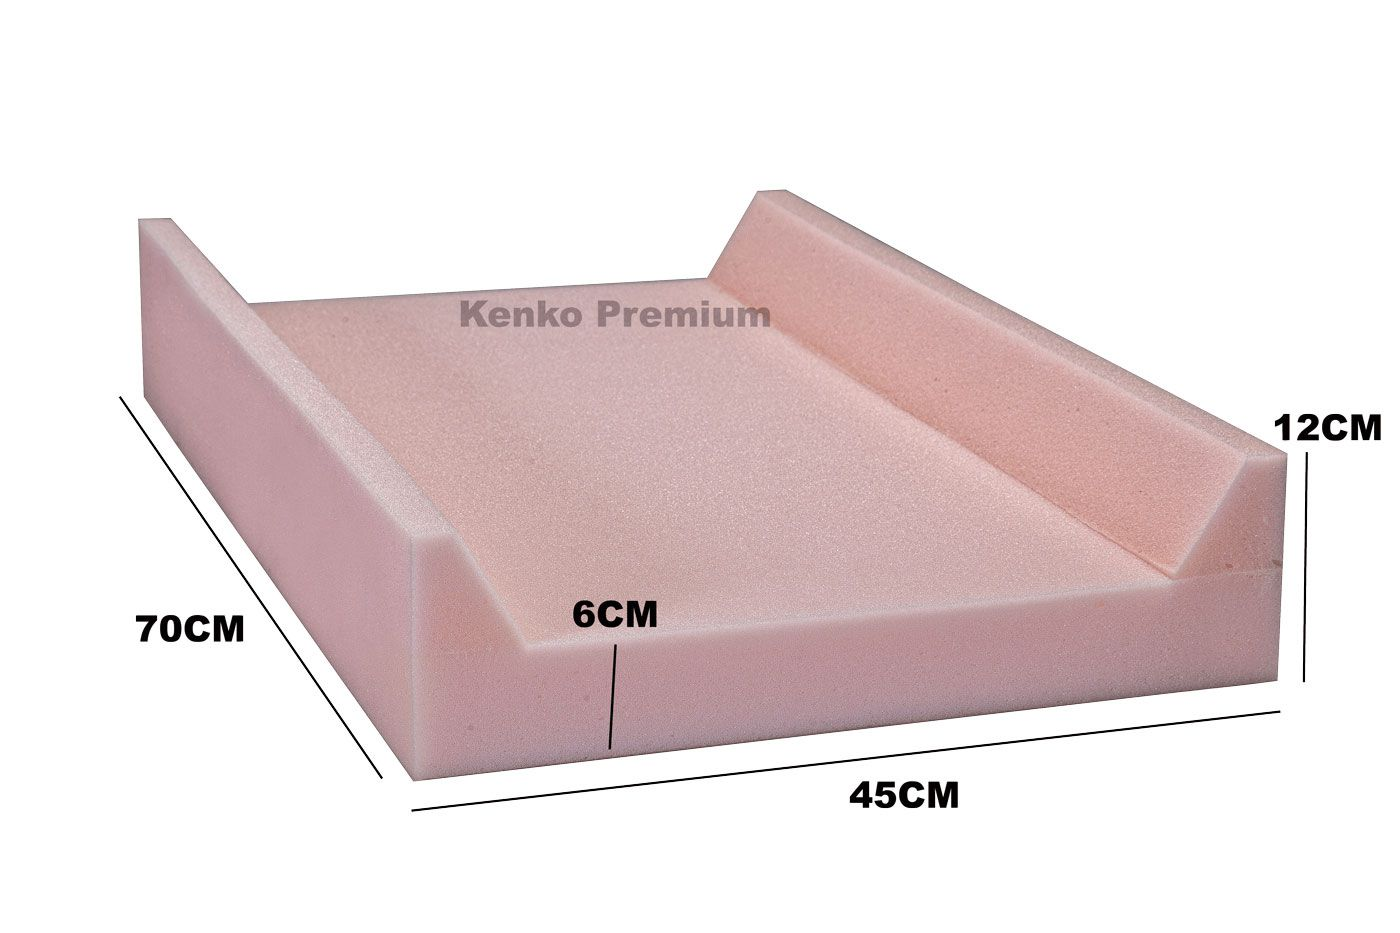 Peça De Espuma Base Trocador Americano 70cm x 45cm x 12cm D23 Kenko Premium  - Kenko Premium Colchões